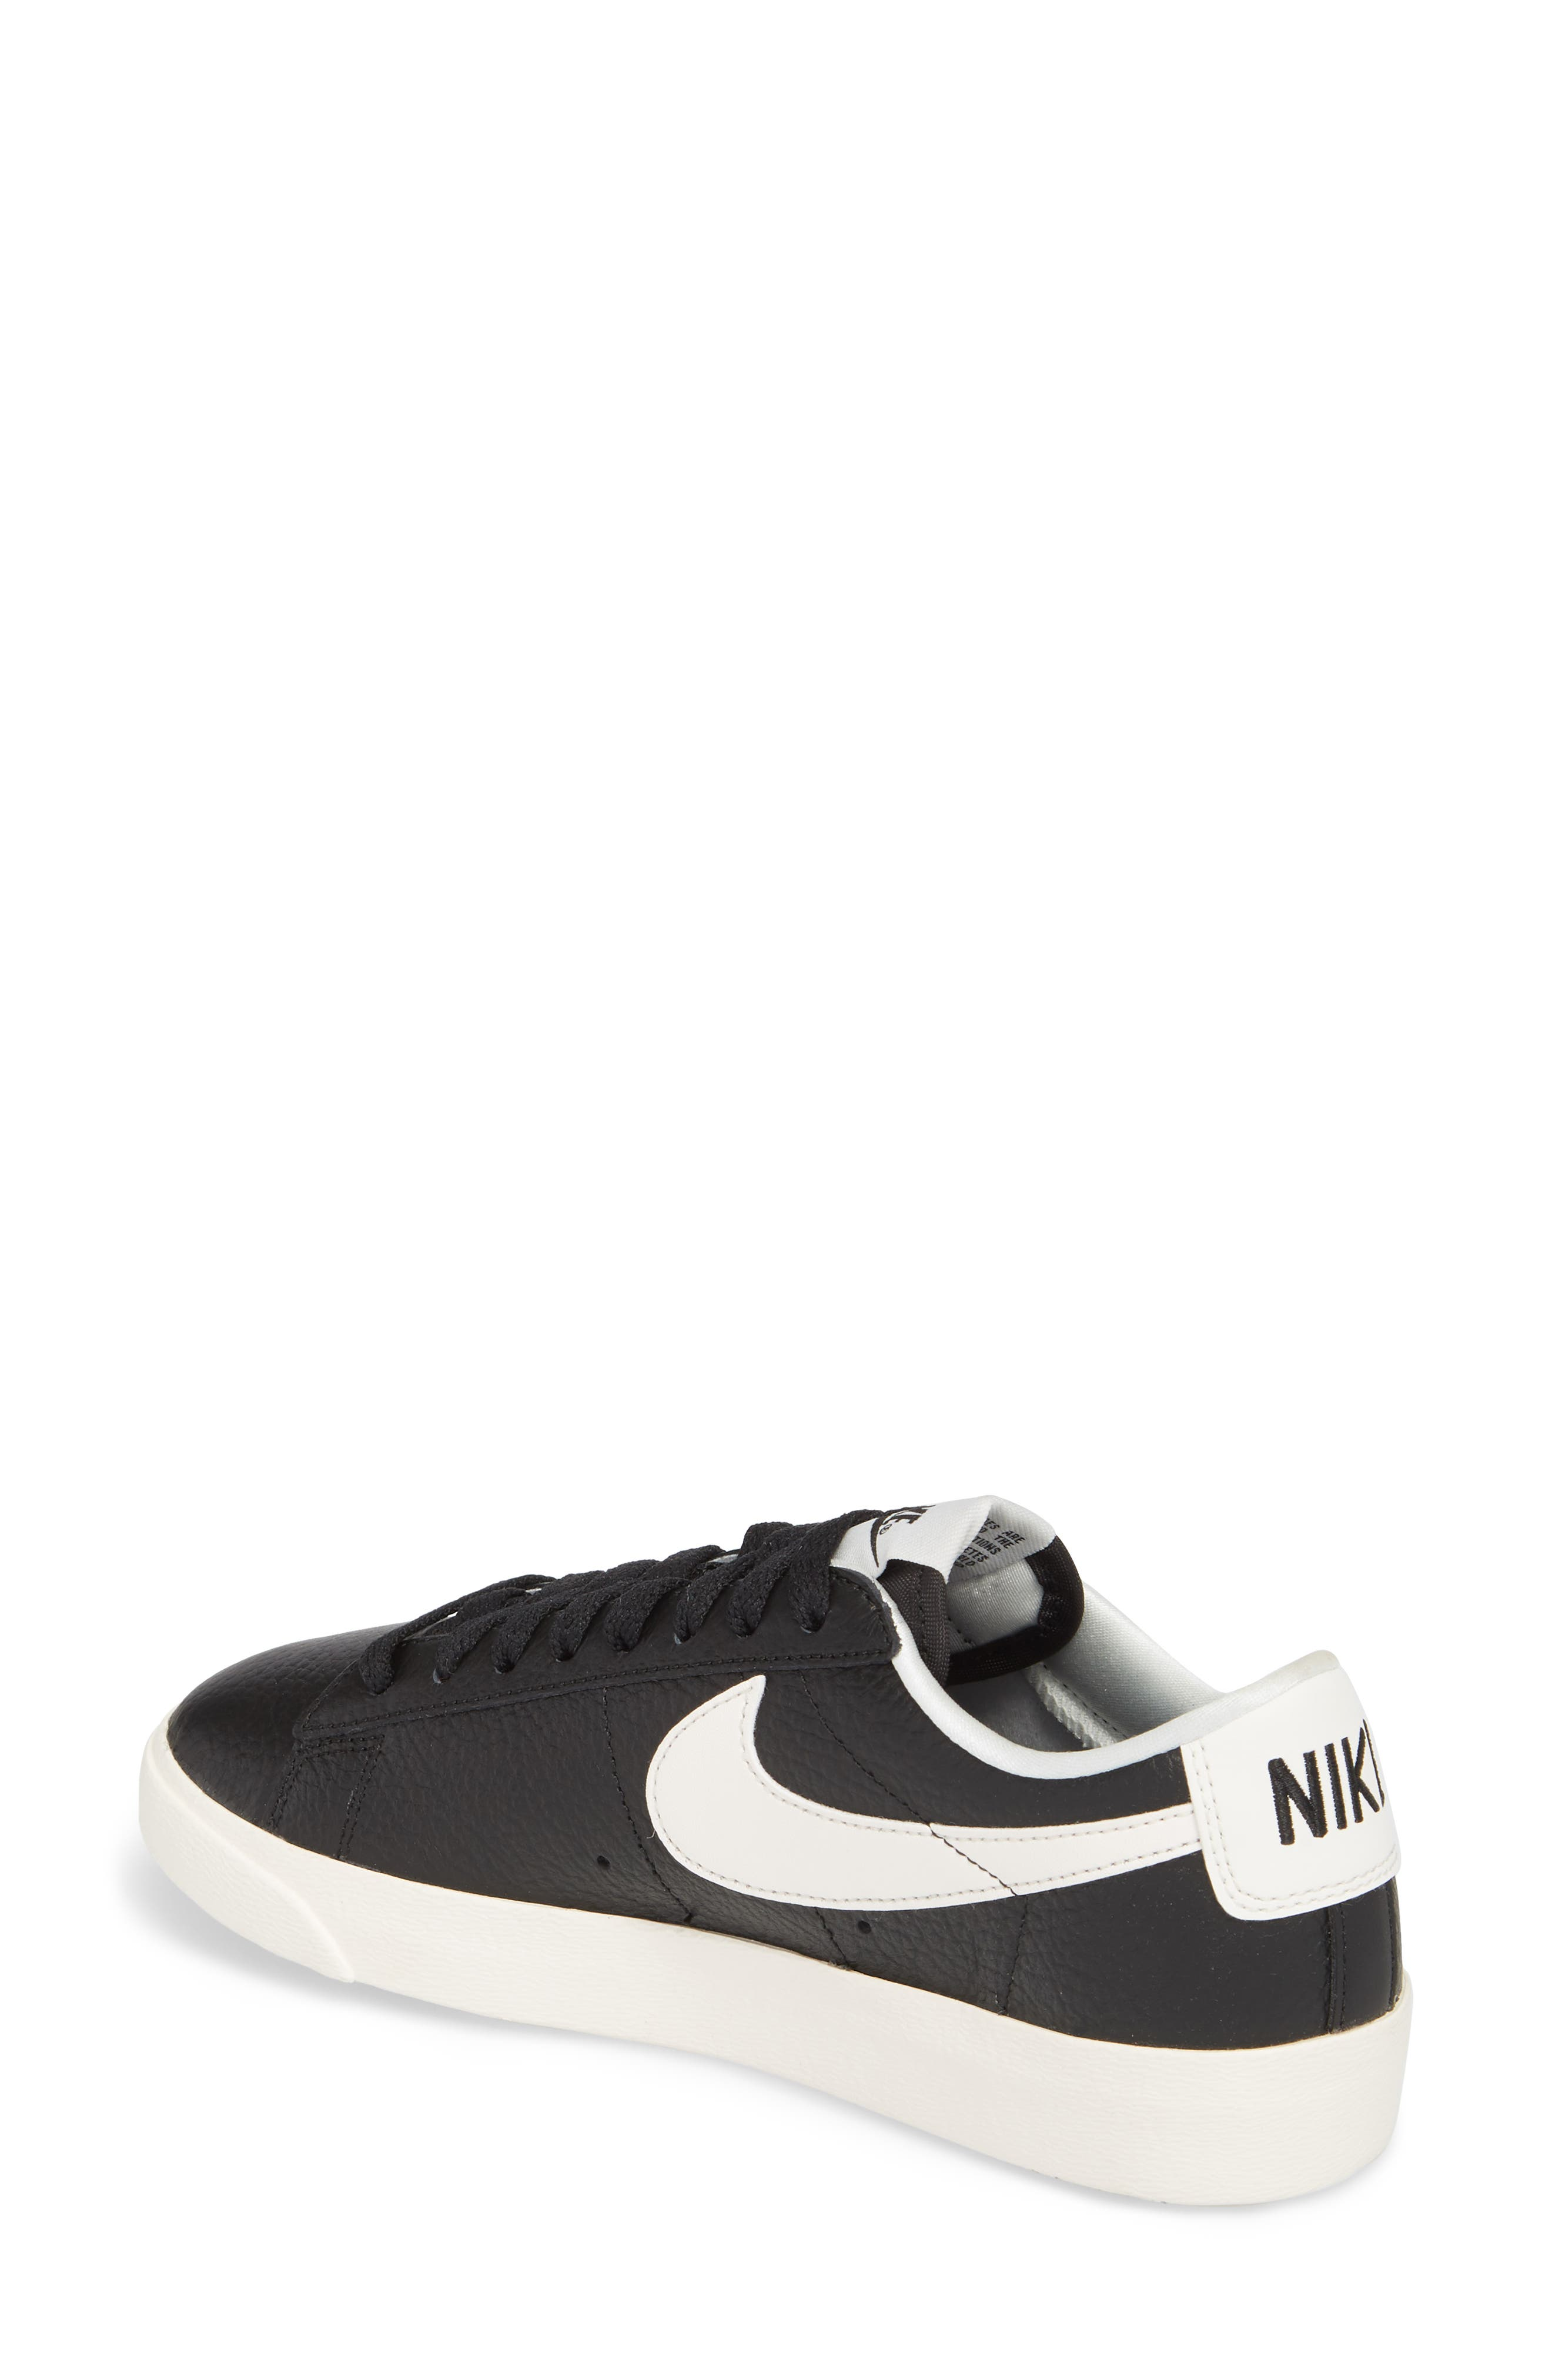 Blazer Premium Low Sneaker,                             Alternate thumbnail 2, color,                             004